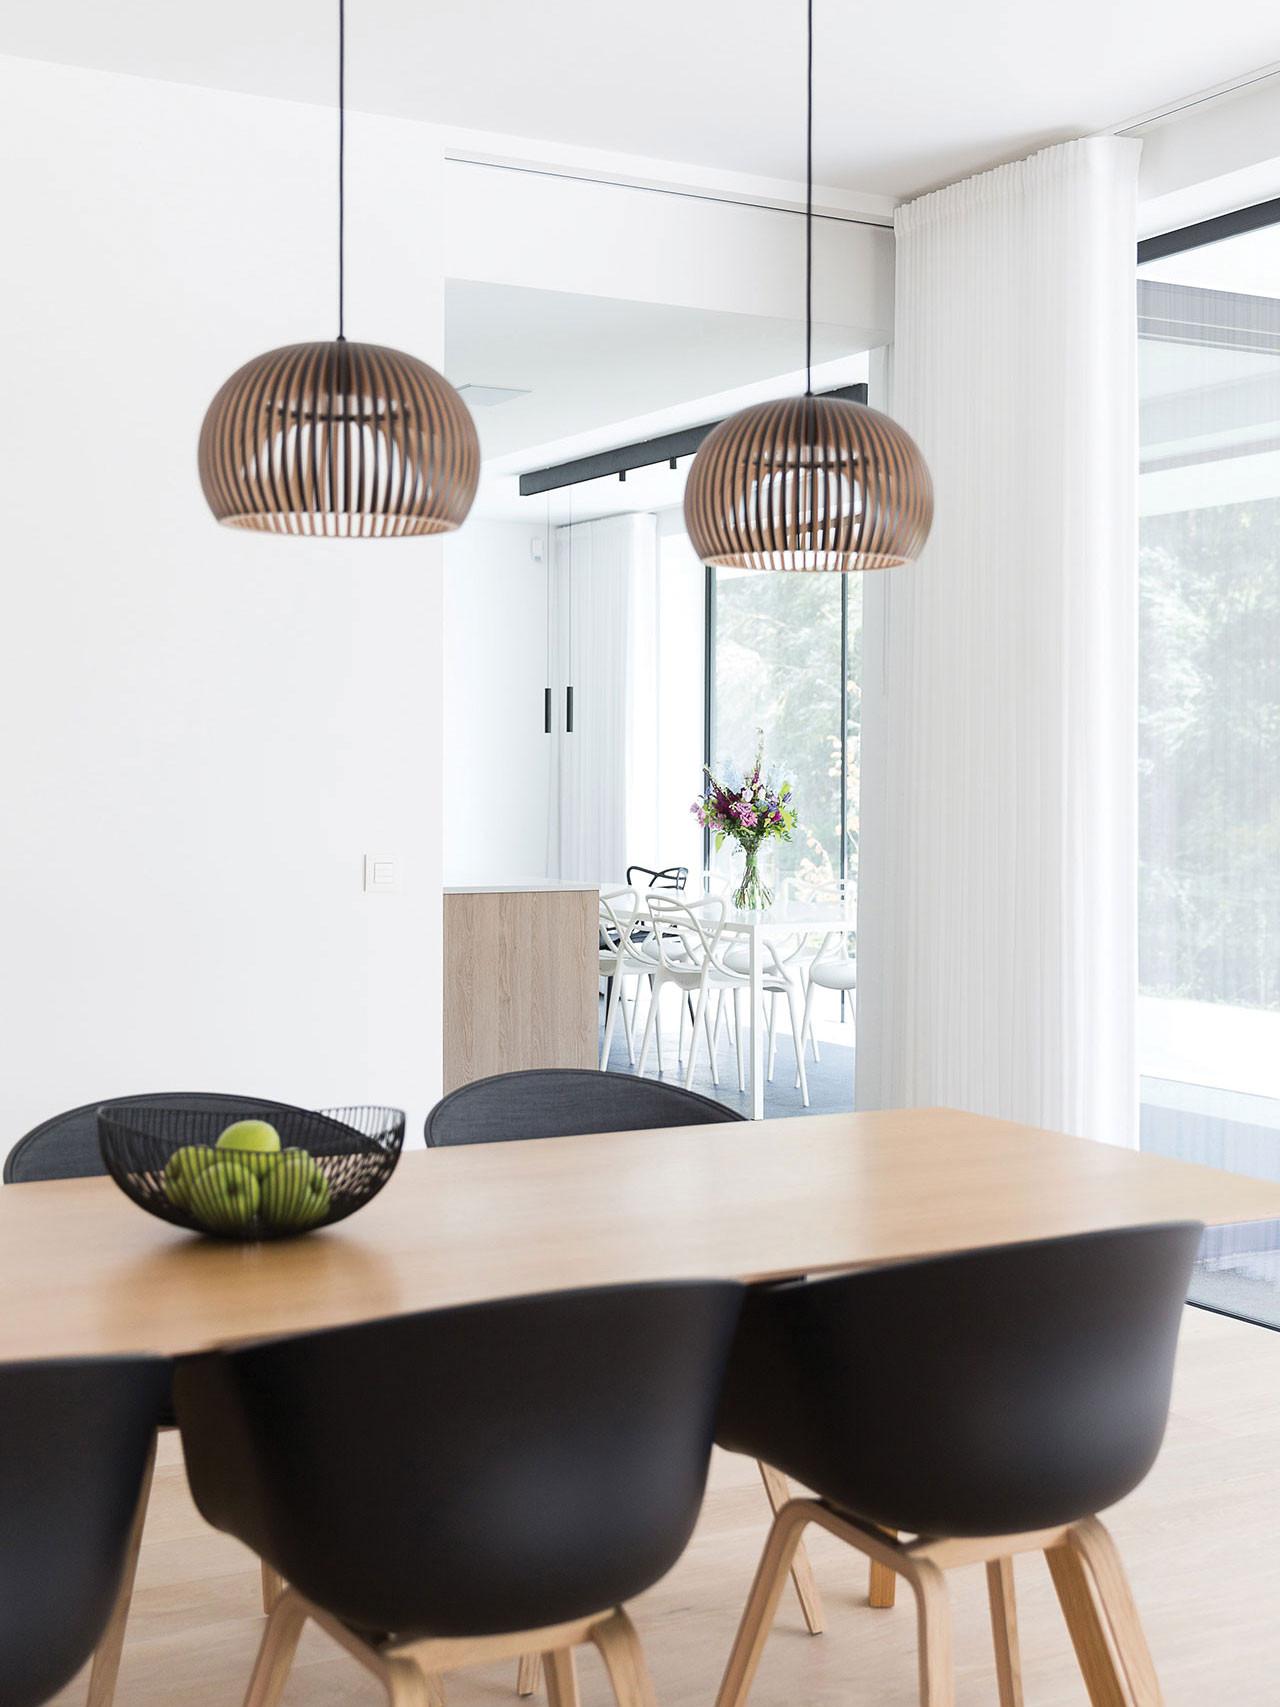 Dekeyzer-hedendaagse-keuken-greeploos-satijnlak-houtdecor-8.jpg